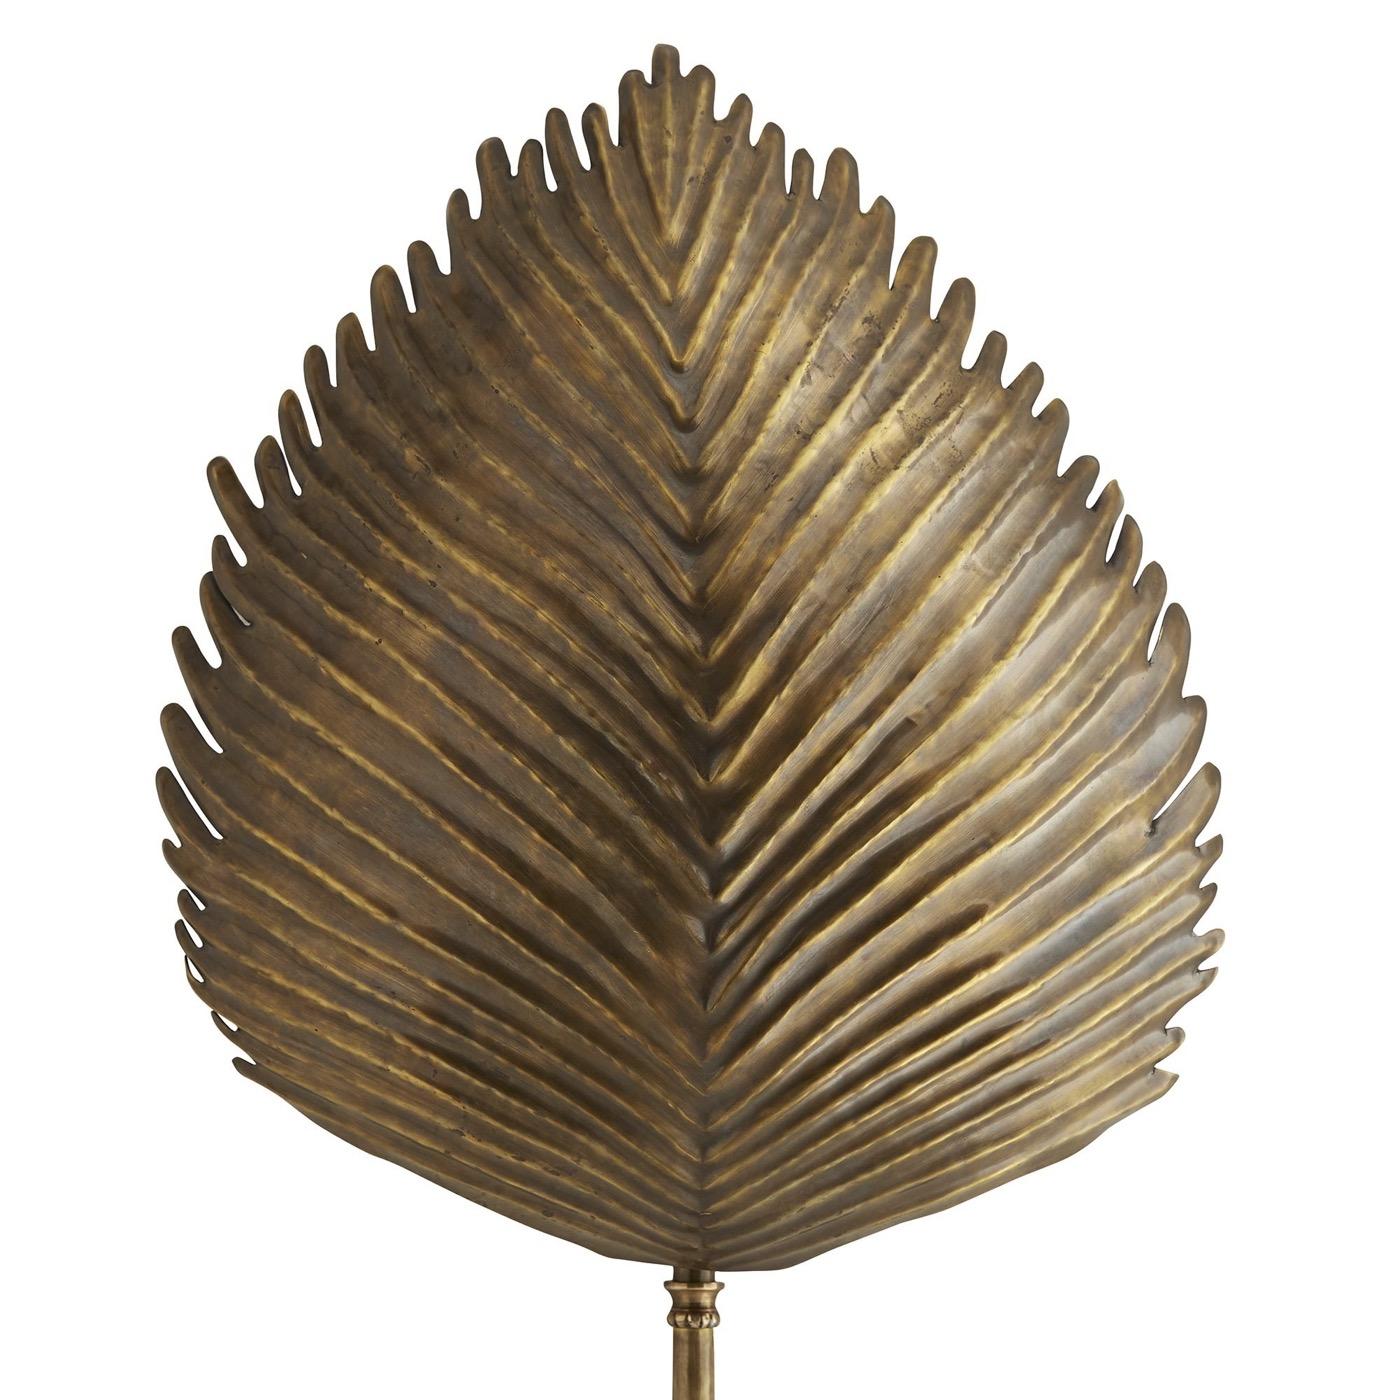 Tropico Brass Leaf Sconce